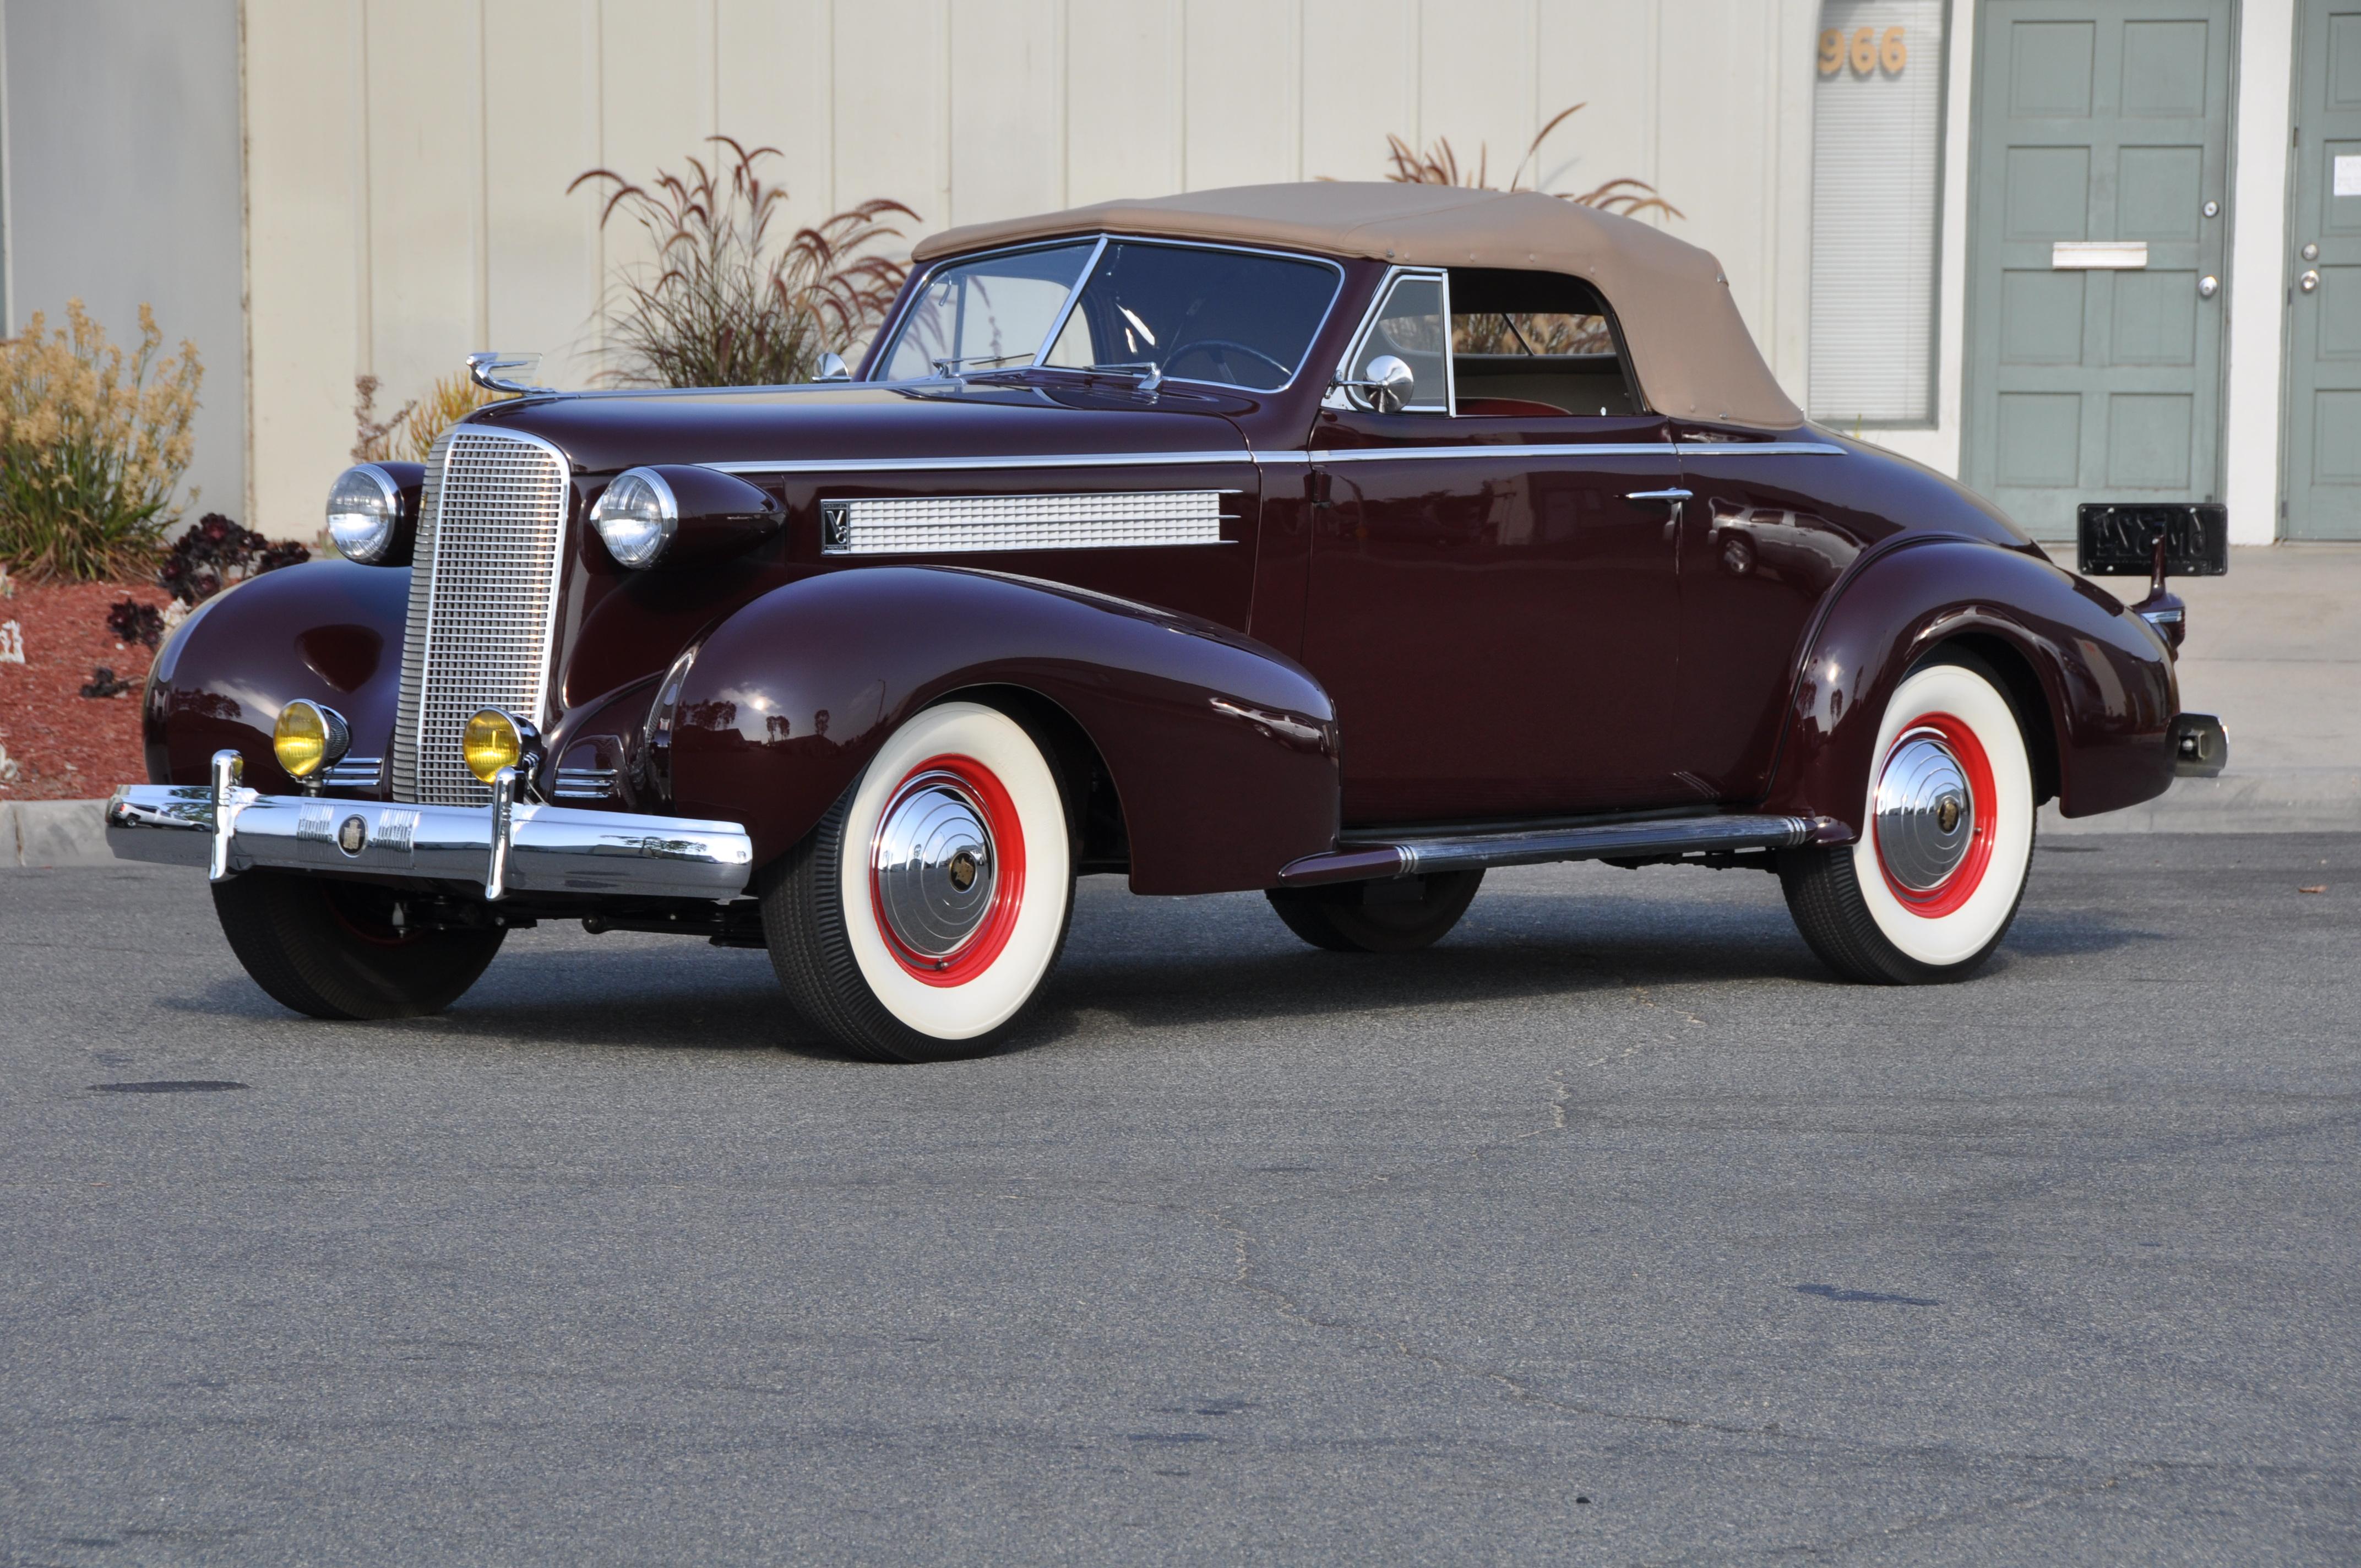 1937 Cadillac Convertible - Astor Devotion Collection